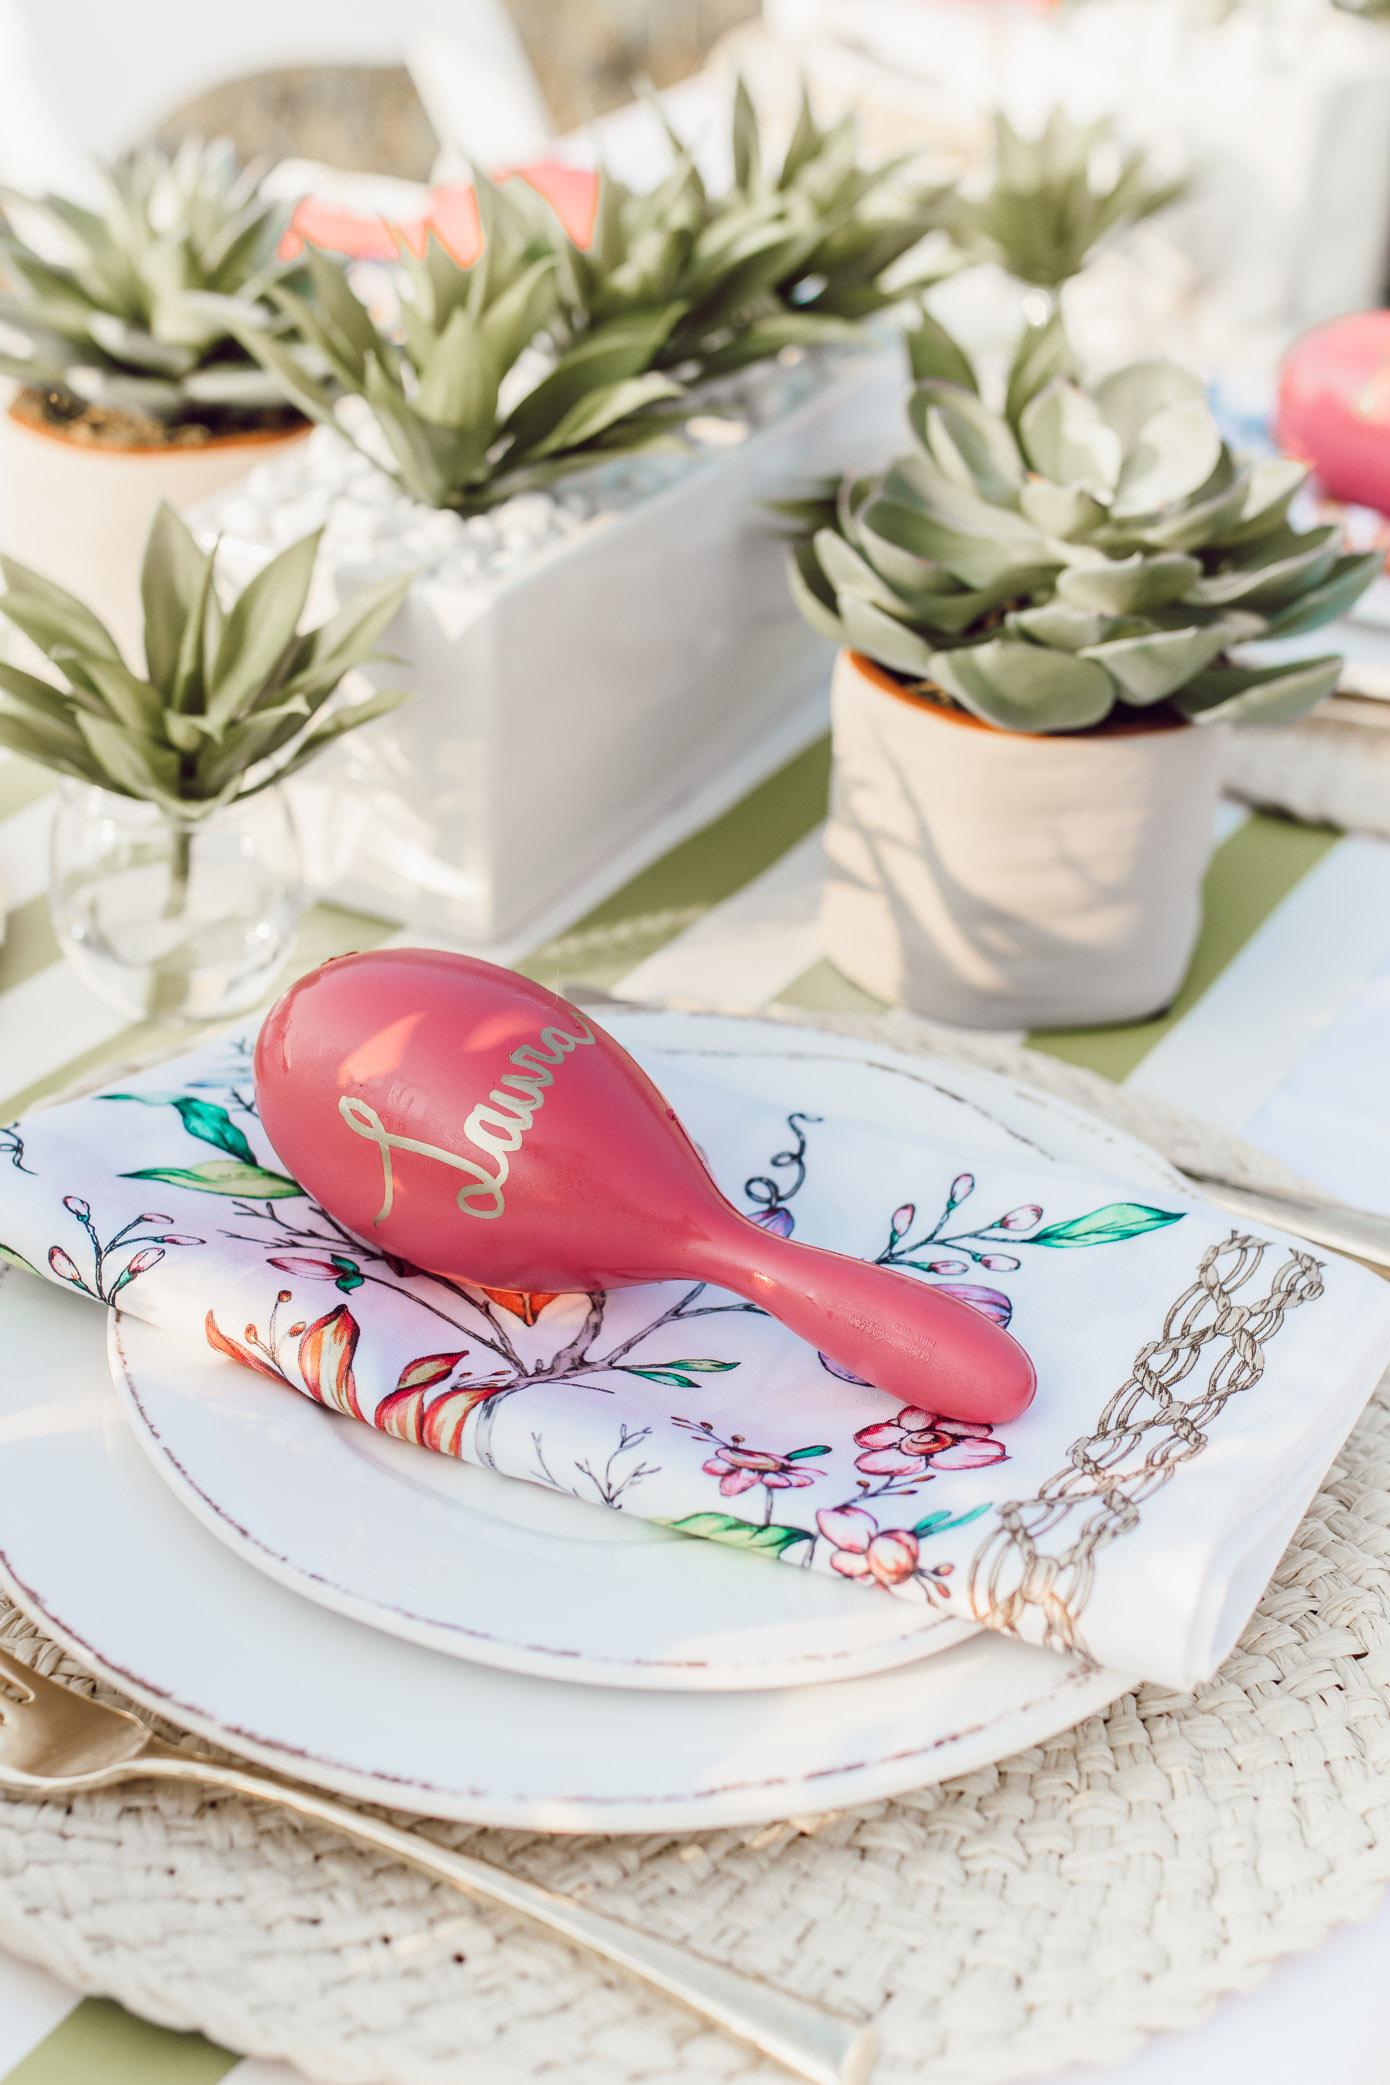 Decor for Backyard Summer Fiesta | Pink Maraca, Fiesta Tablescape | Louella Reese